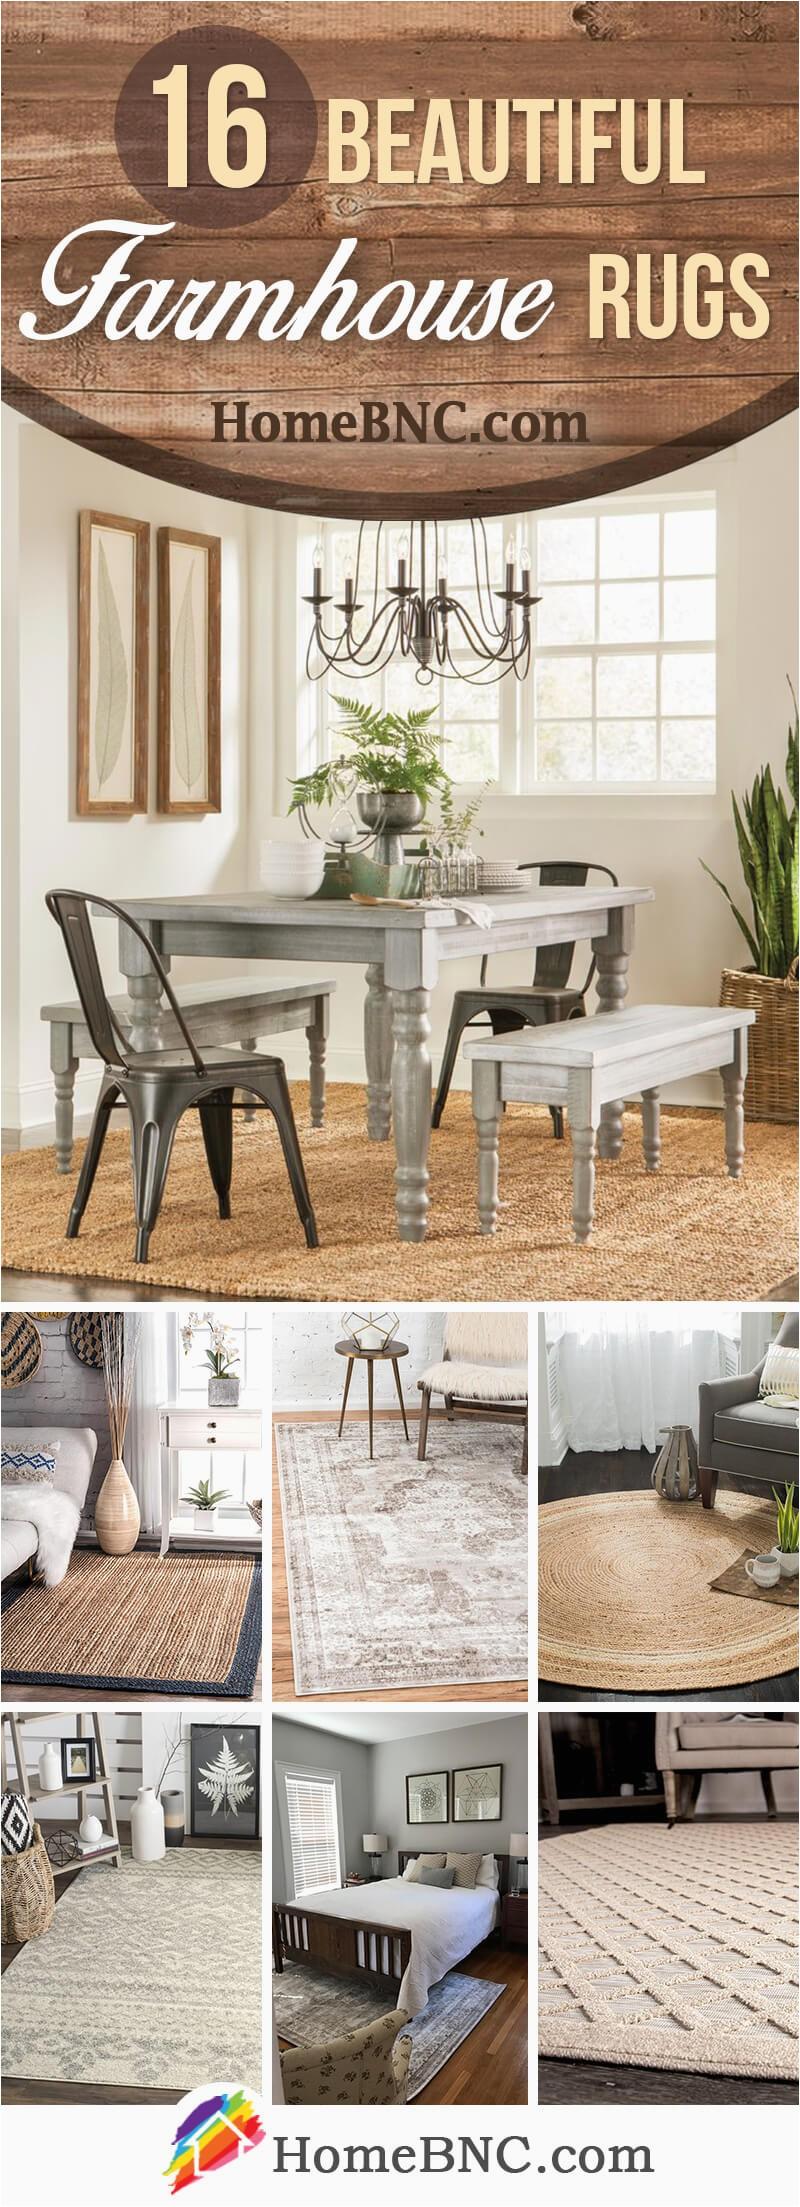 farmhouse rug ideas pinterest share homebnc v2